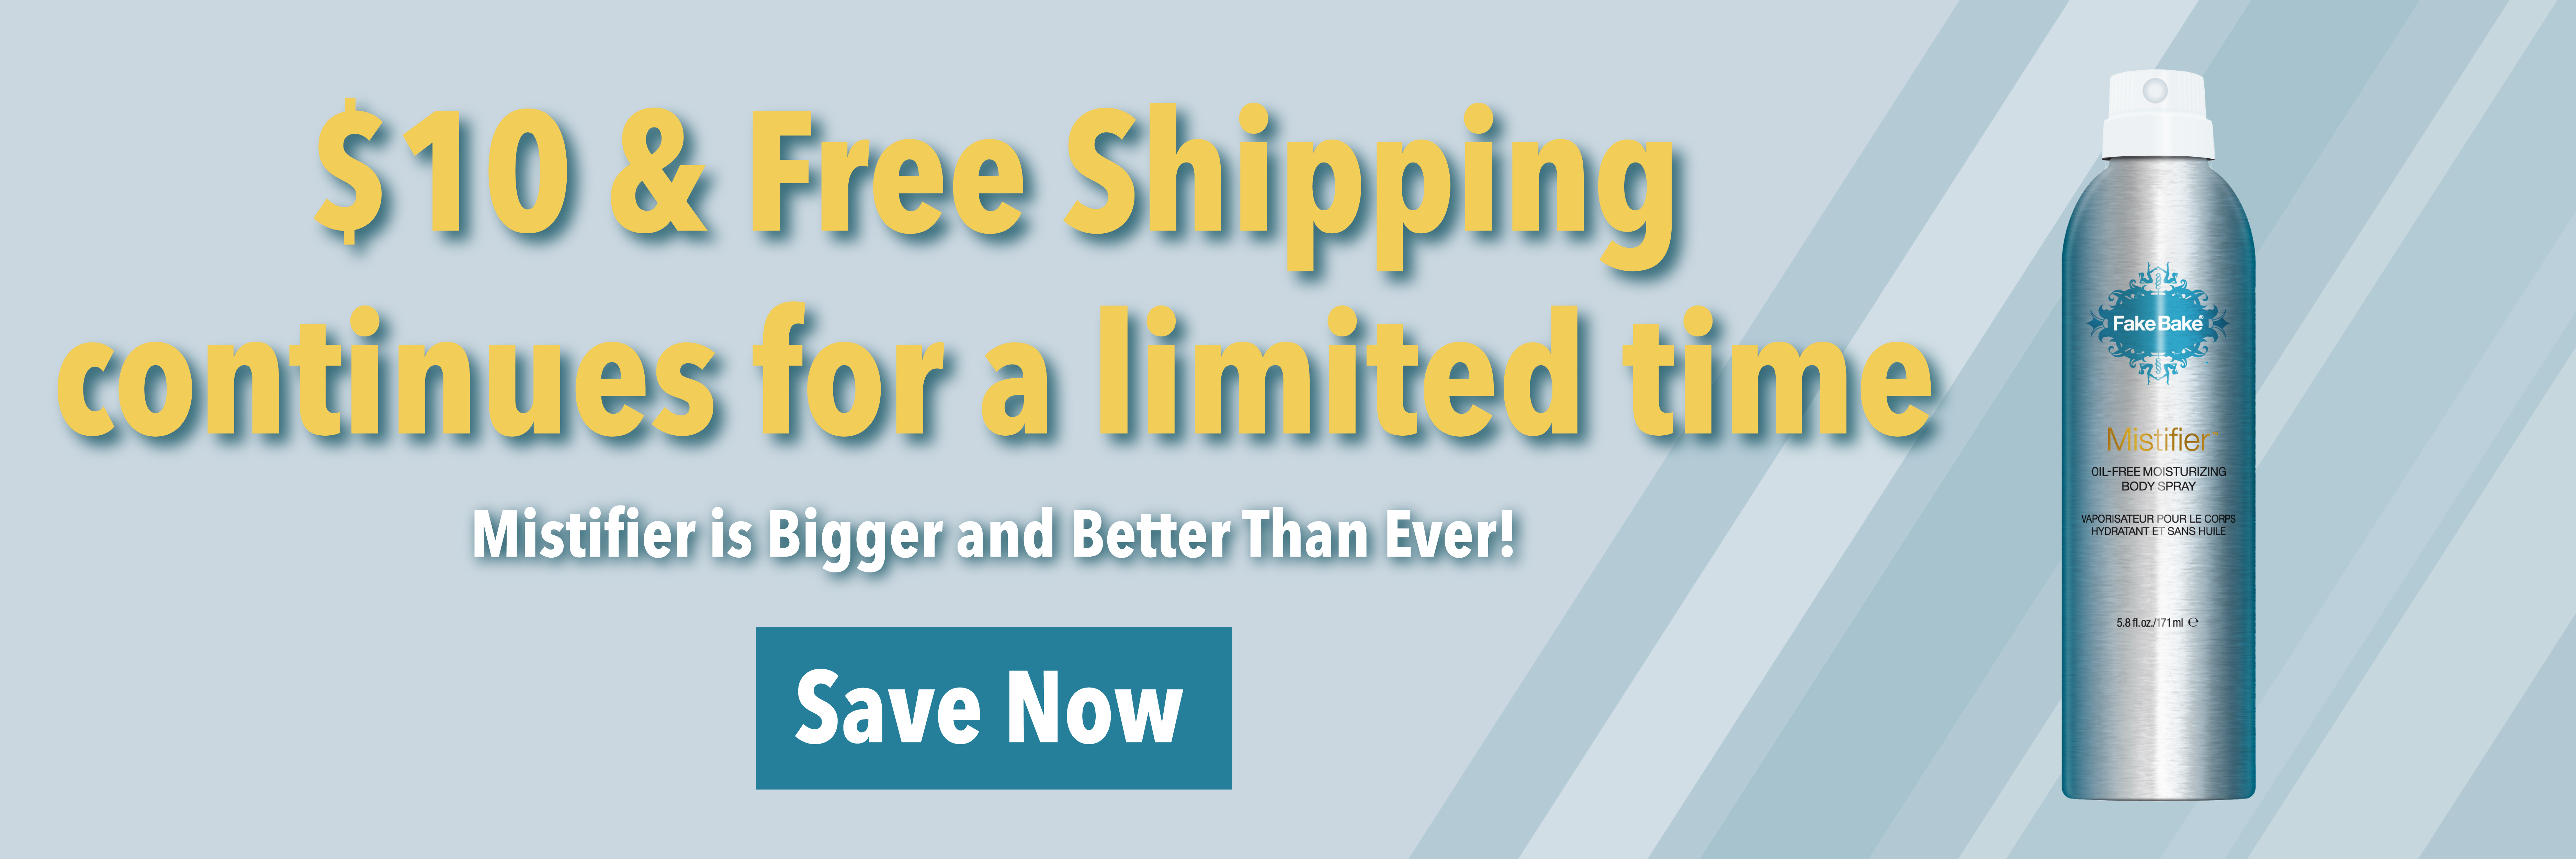 Mistifier $10 Plus Free Shipping